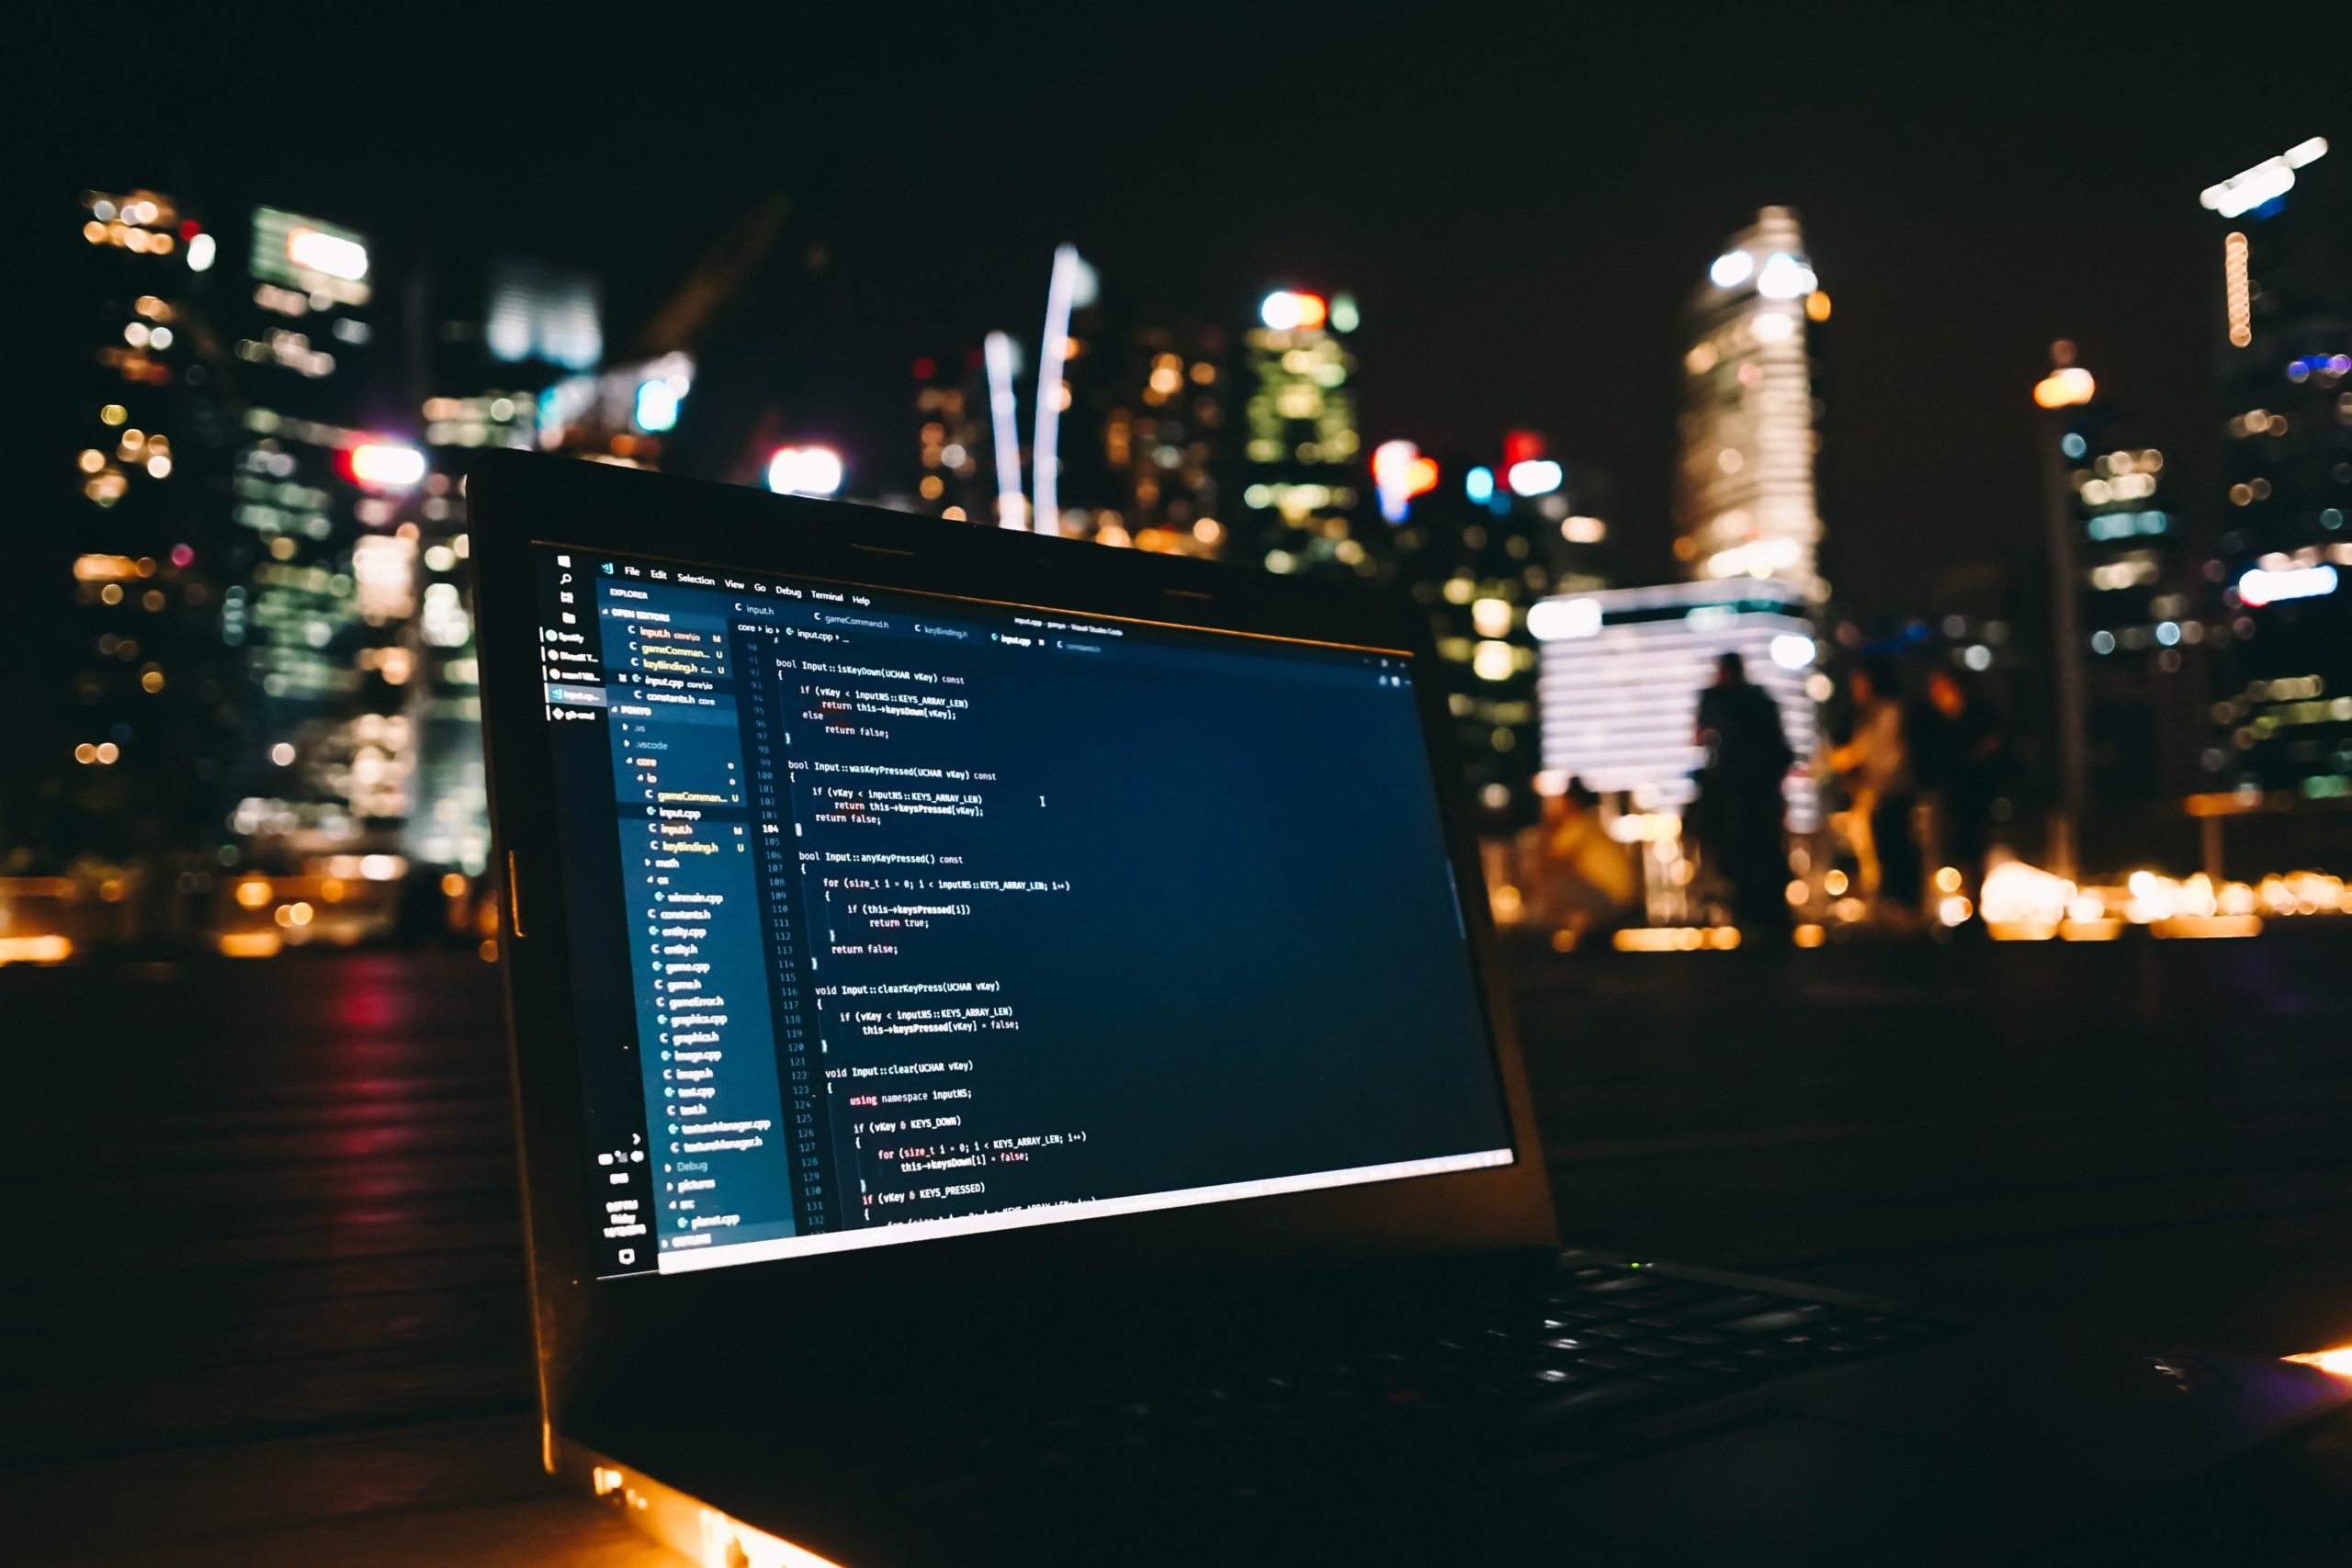 IT業界への転職を成功させるために夜にプログラミング勉強中